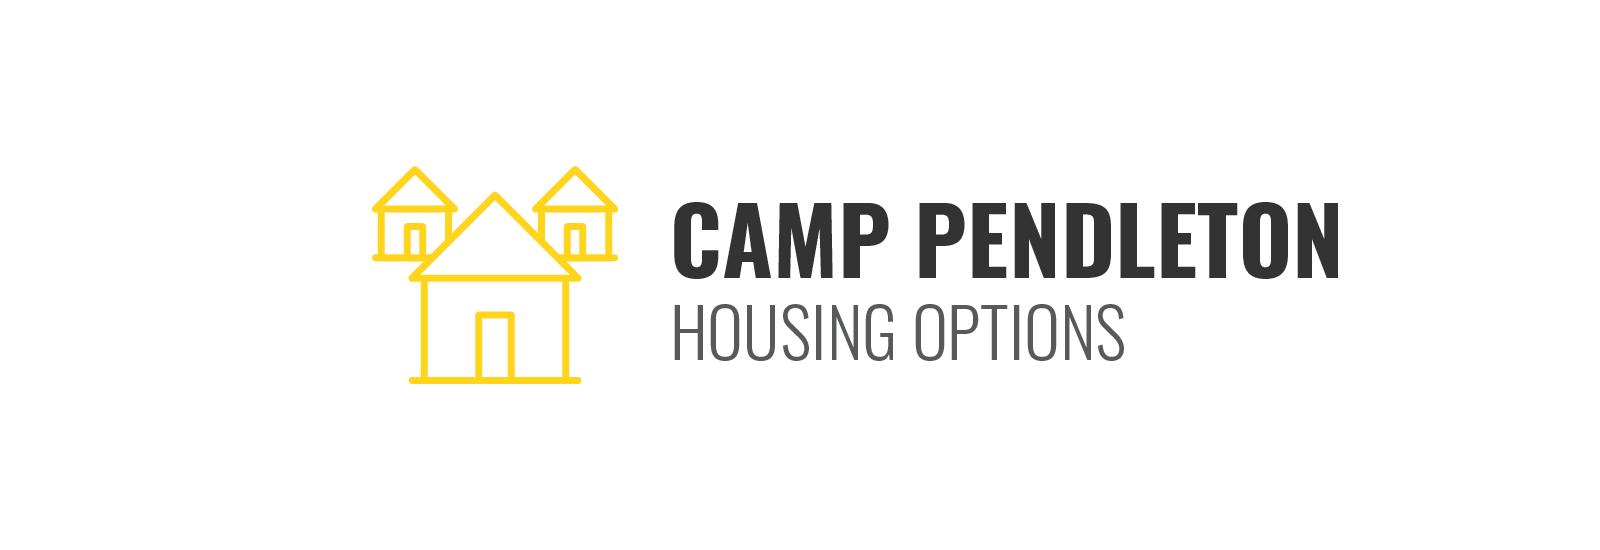 Camp Pendleton Housing Options